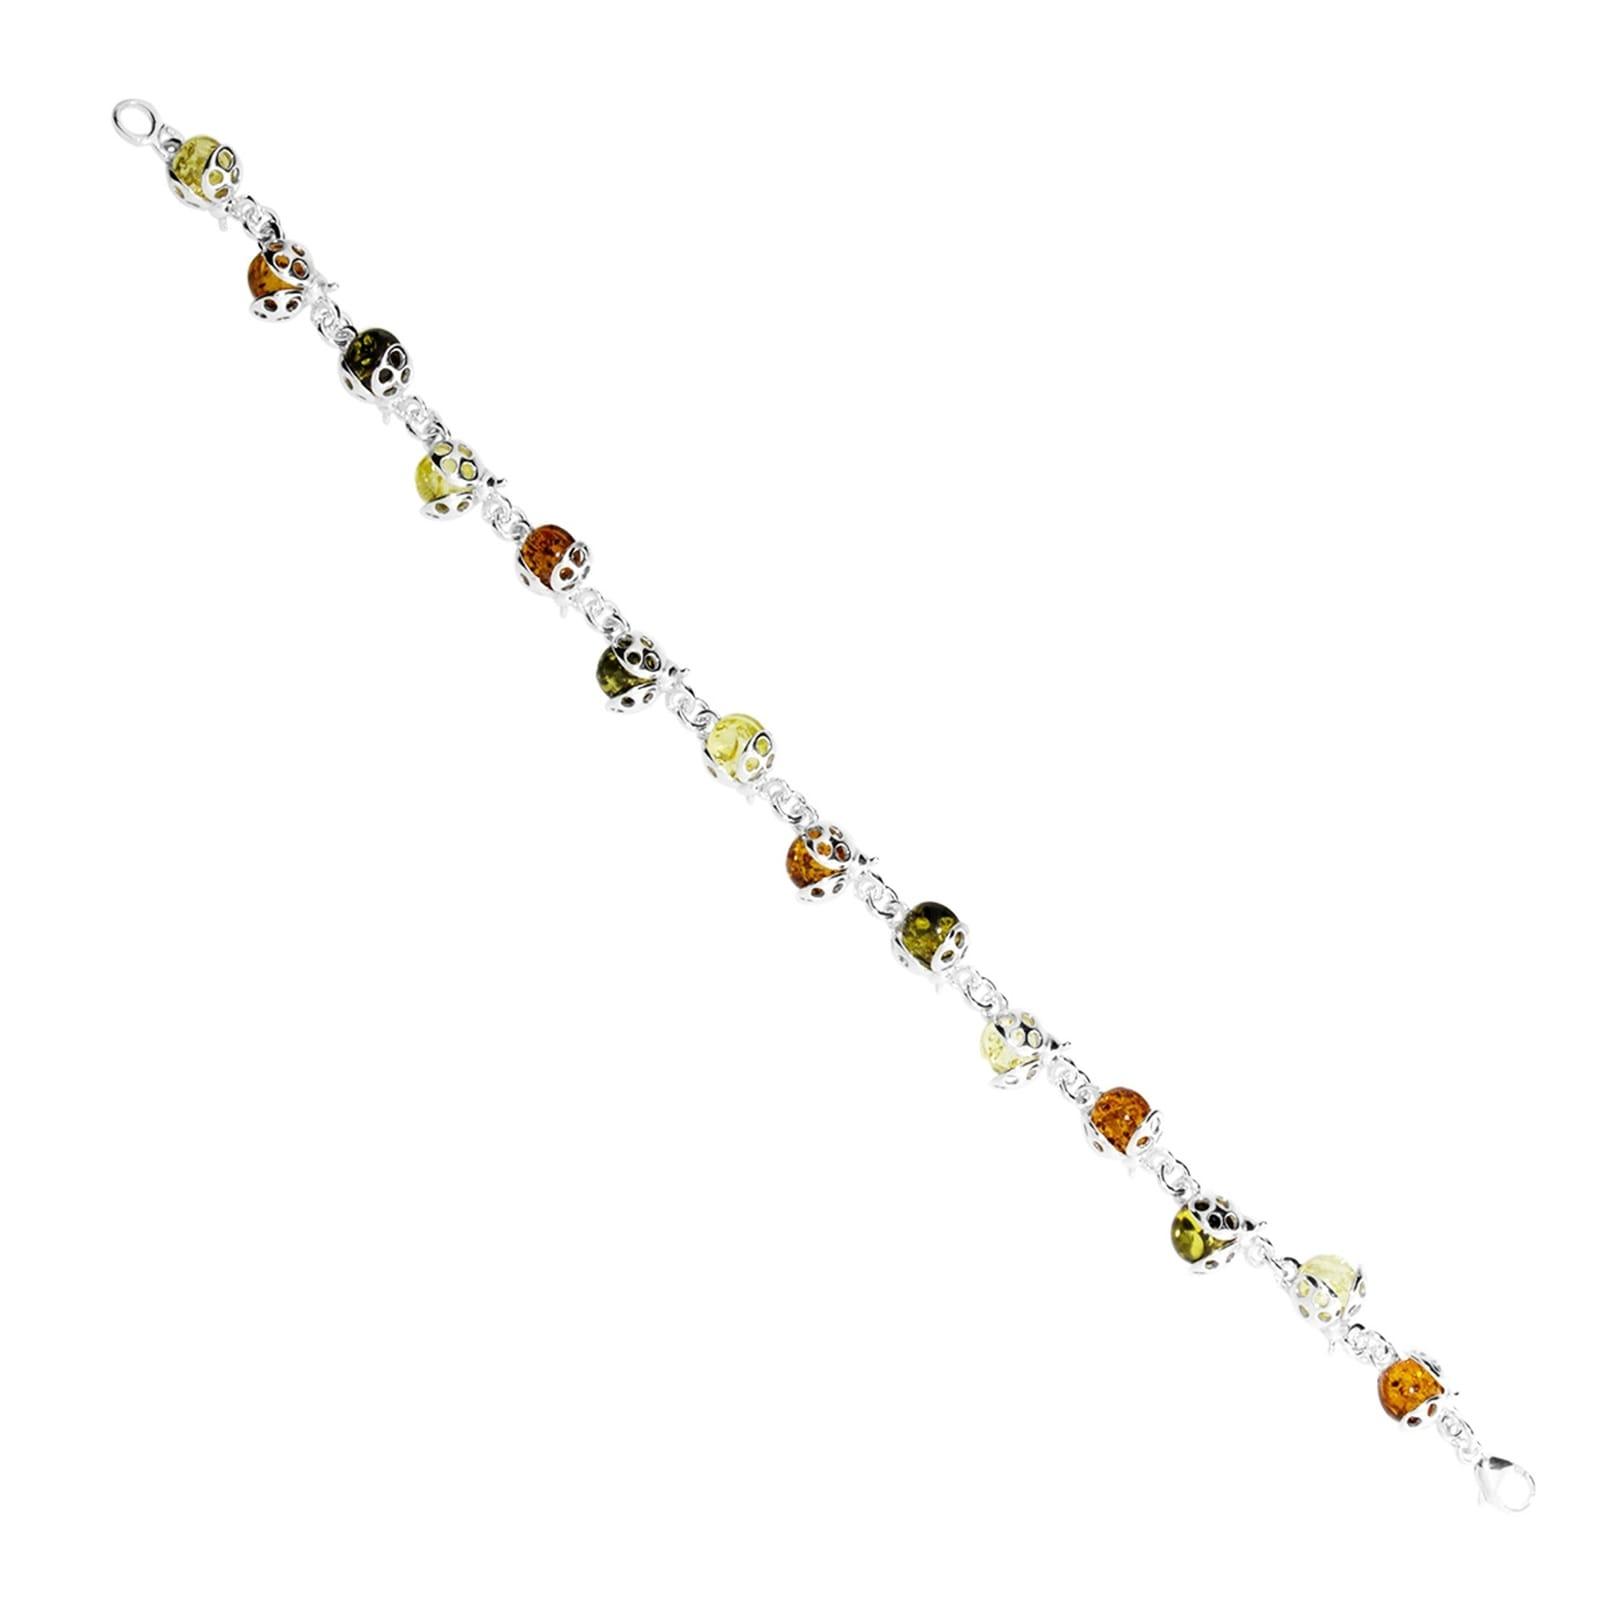 OSTSEE-SCHMUCK Armband Marienkäfer Silber 925/000 Bernstein | Schmuck > Armbänder > Silberarmbänder | Ostsee-Schmuck